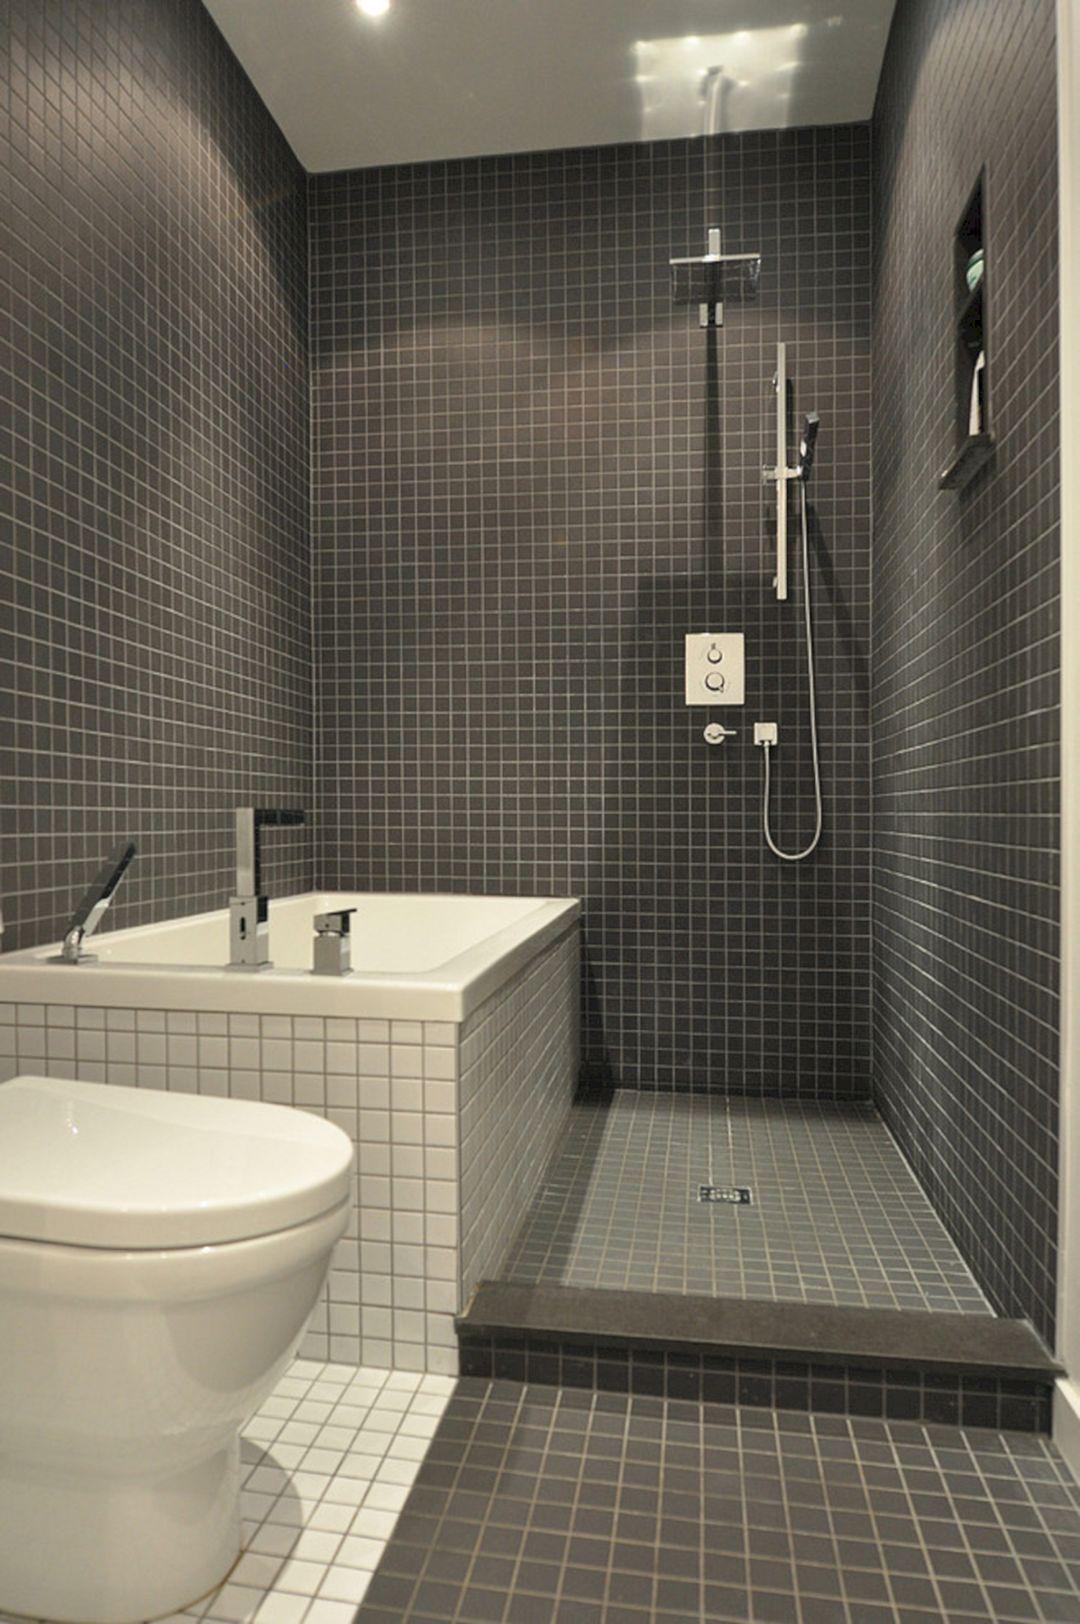 30 Attractive Small Bathtub Design For Cozy Bathroom Ideas Freshouz Com Bathroom Design Small Small Bathroom Tiles Bathroom Layout